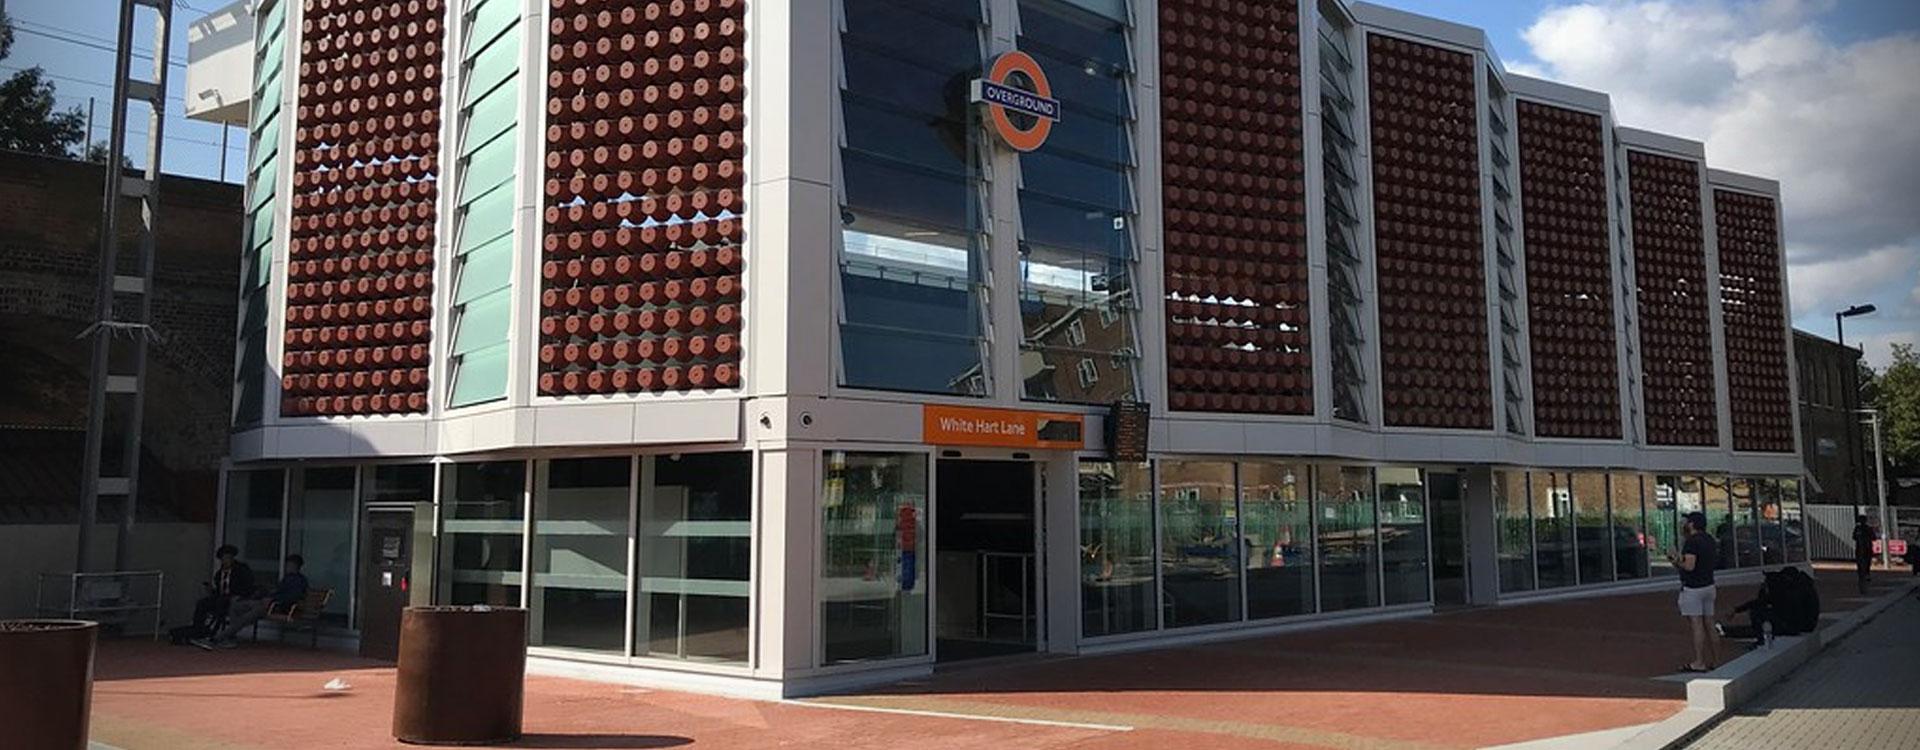 White Hart Lane Overground Station Gets Potty Upgrade